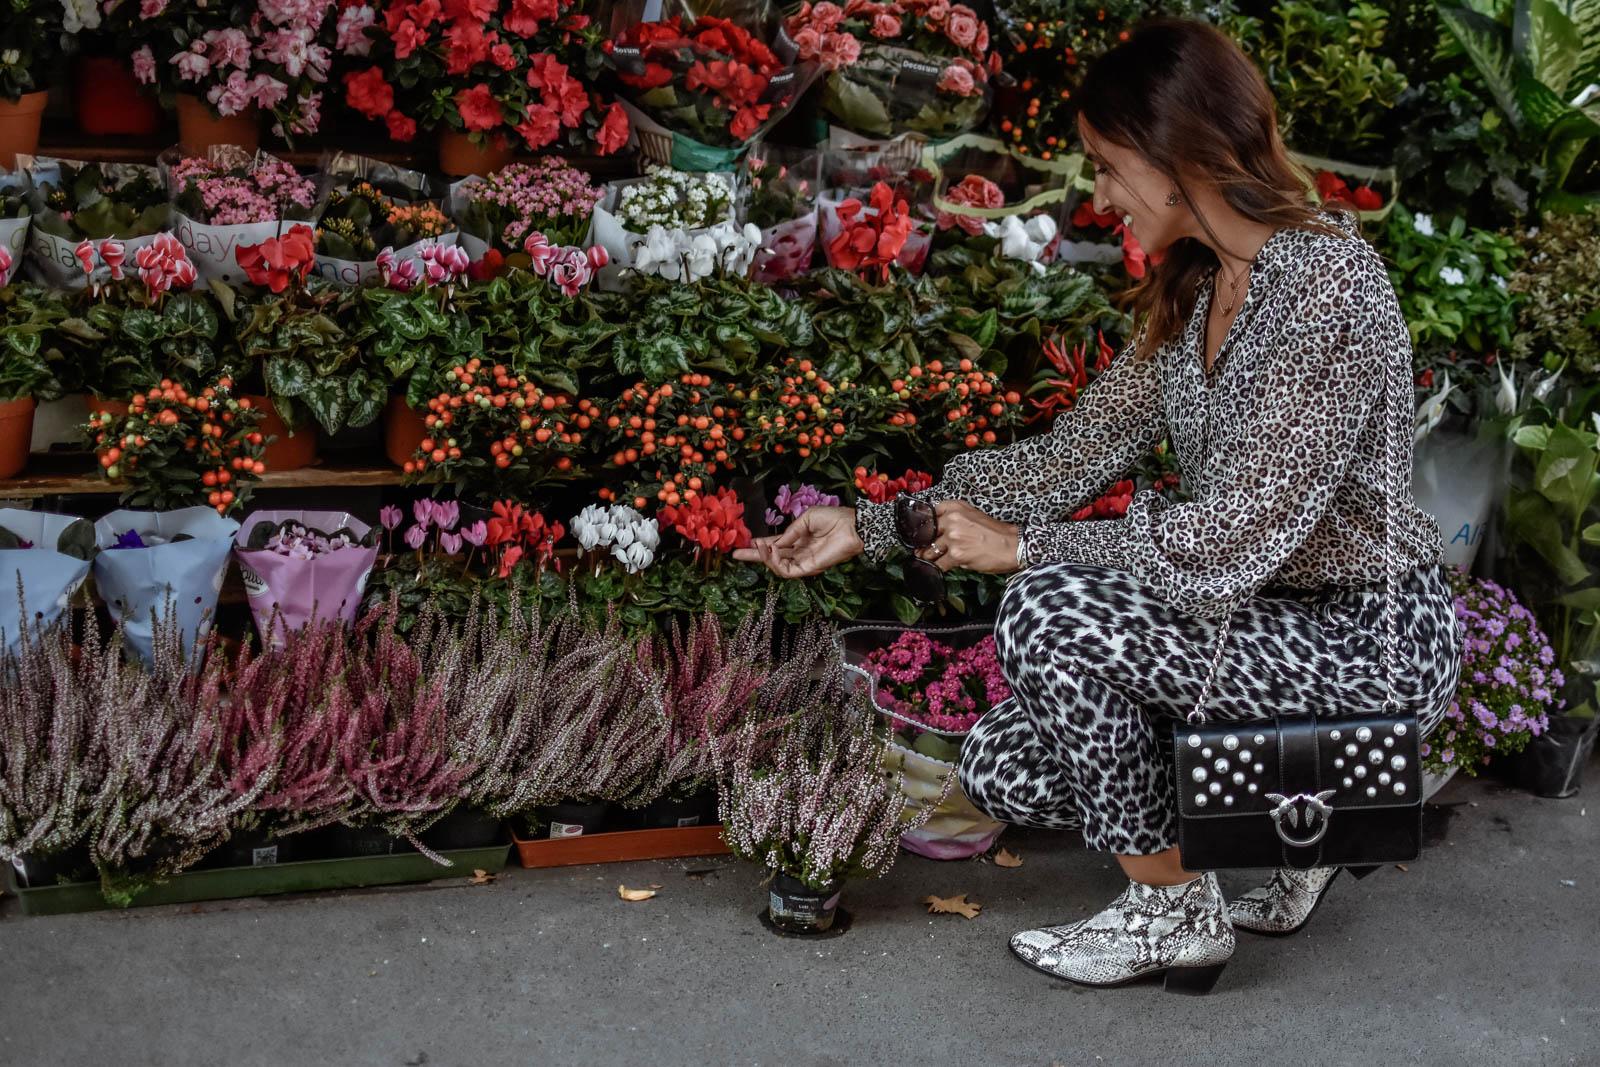 el-blog-de-silvia-rodriguez-street-style-mfw-fashion-show-alberto-zambelli-milan-fashion-week-pinko-look-blogger